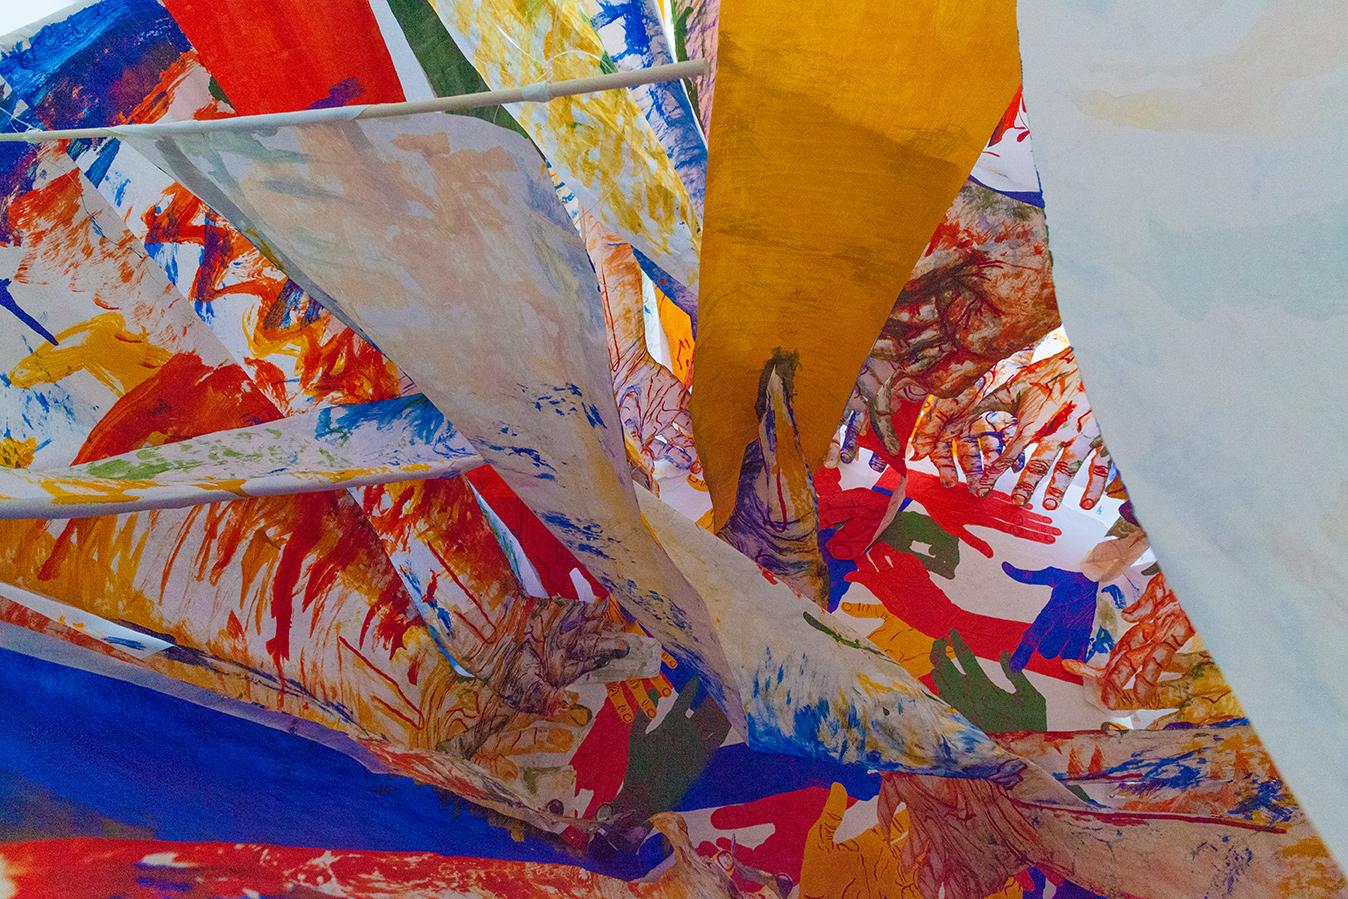 hands-tesseract-installation-hand-sails-mirena-rhee_03.jpg